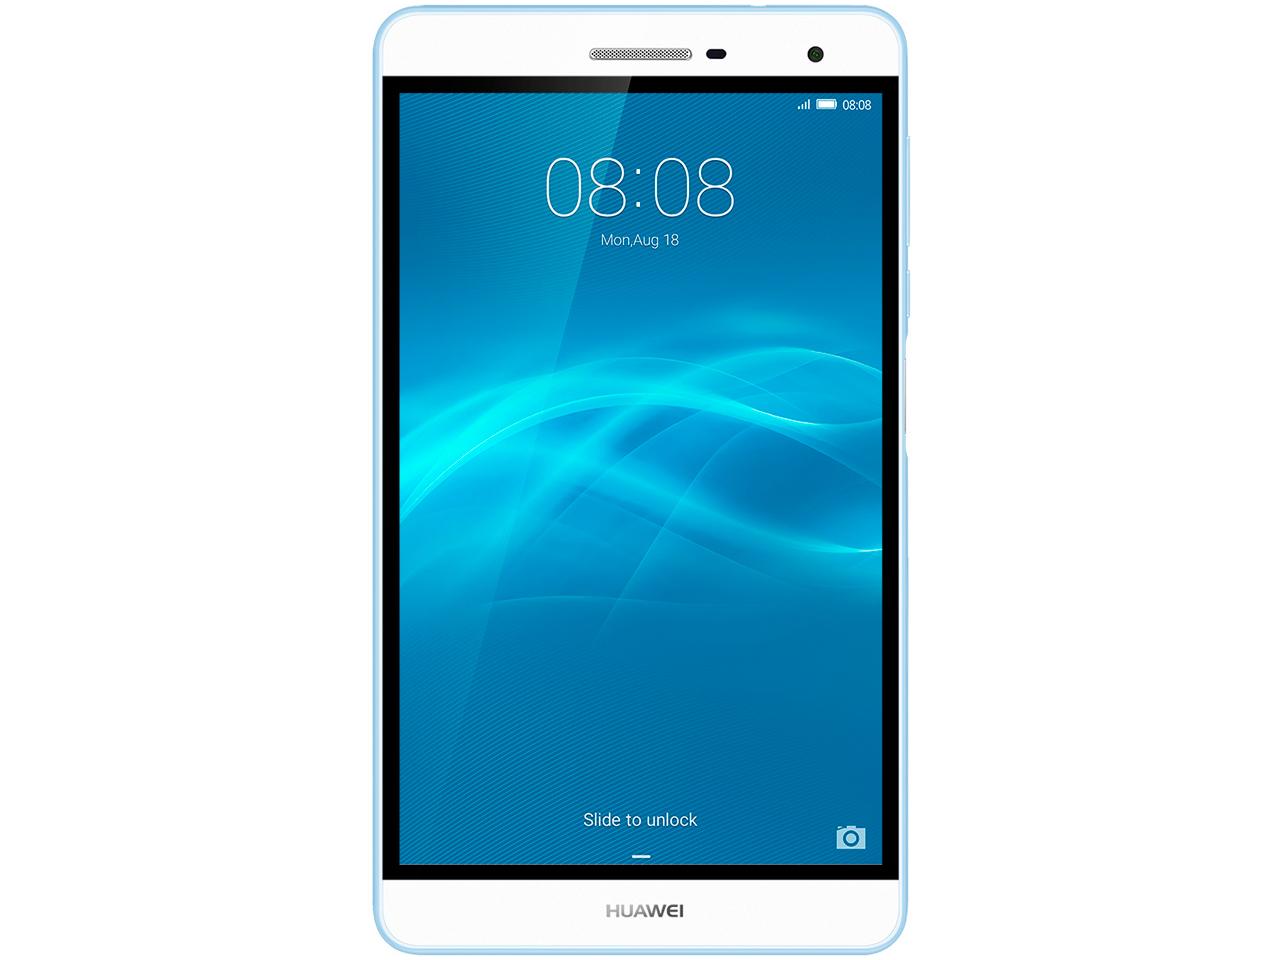 MediaPad T2 7.0 Pro LTEモデル SIMフリー [ブルー] の製品画像